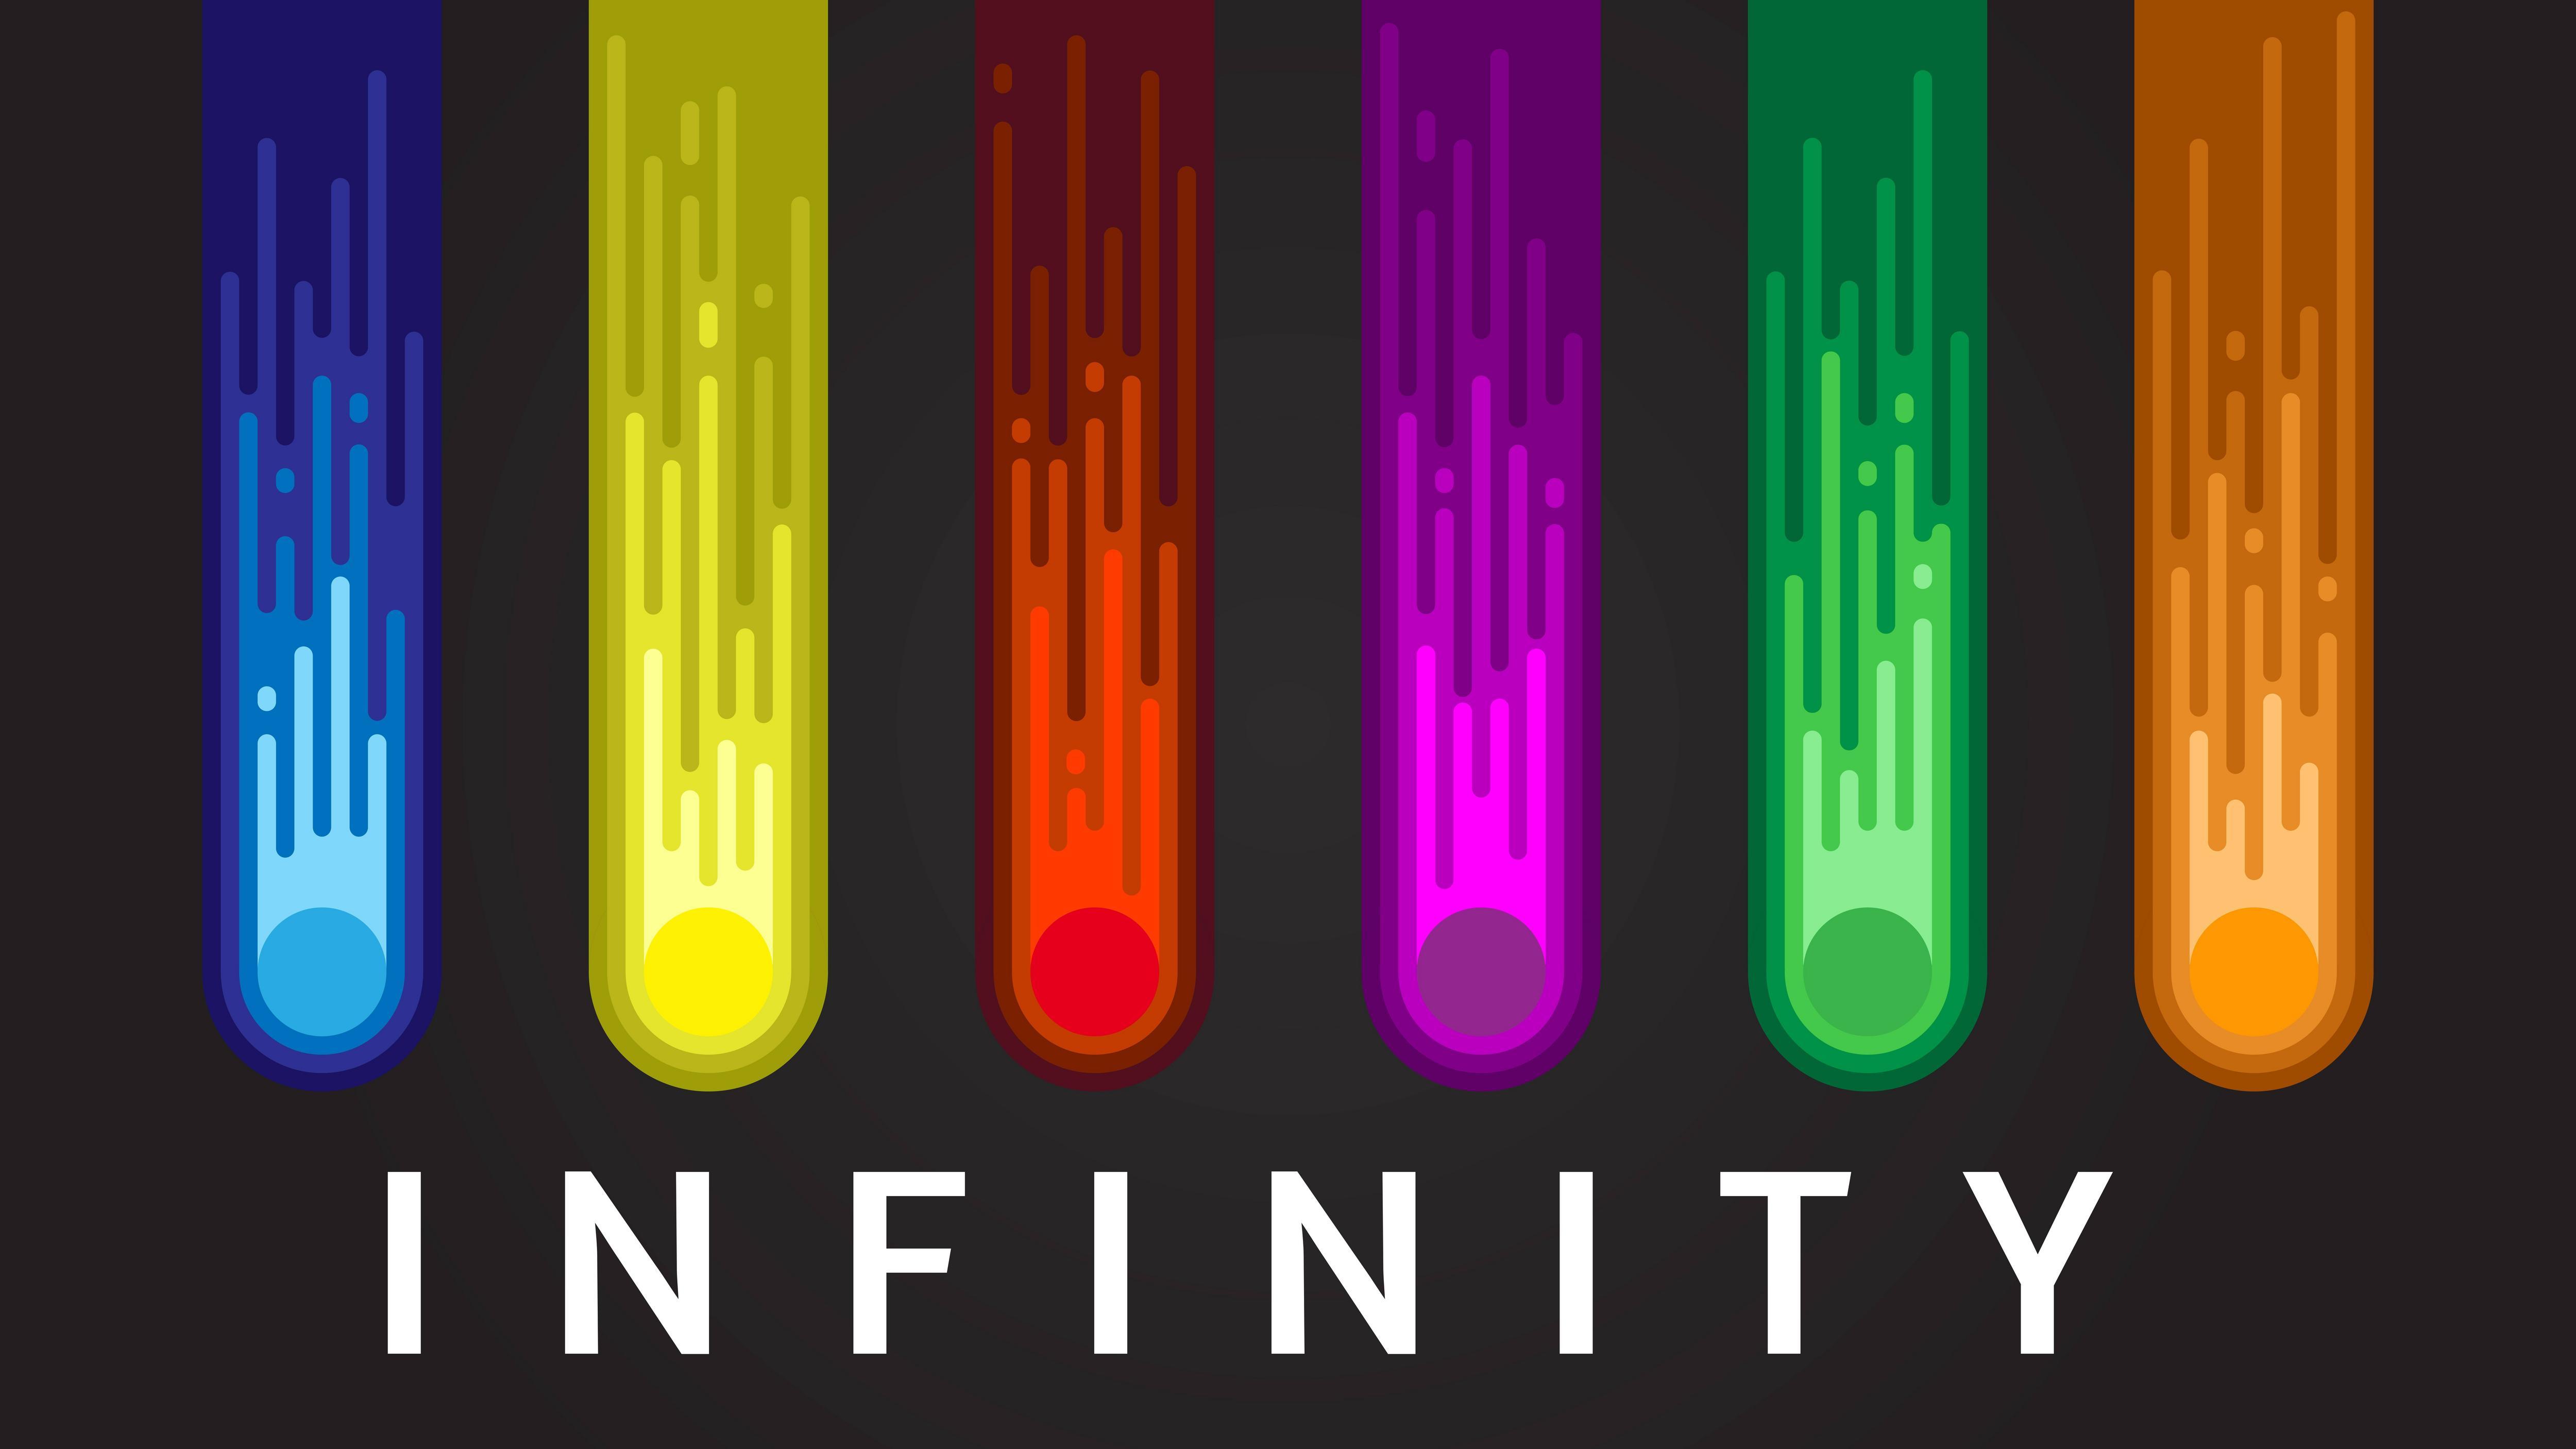 Thanos Infinity War Wallpapers - Wallpaper Cave